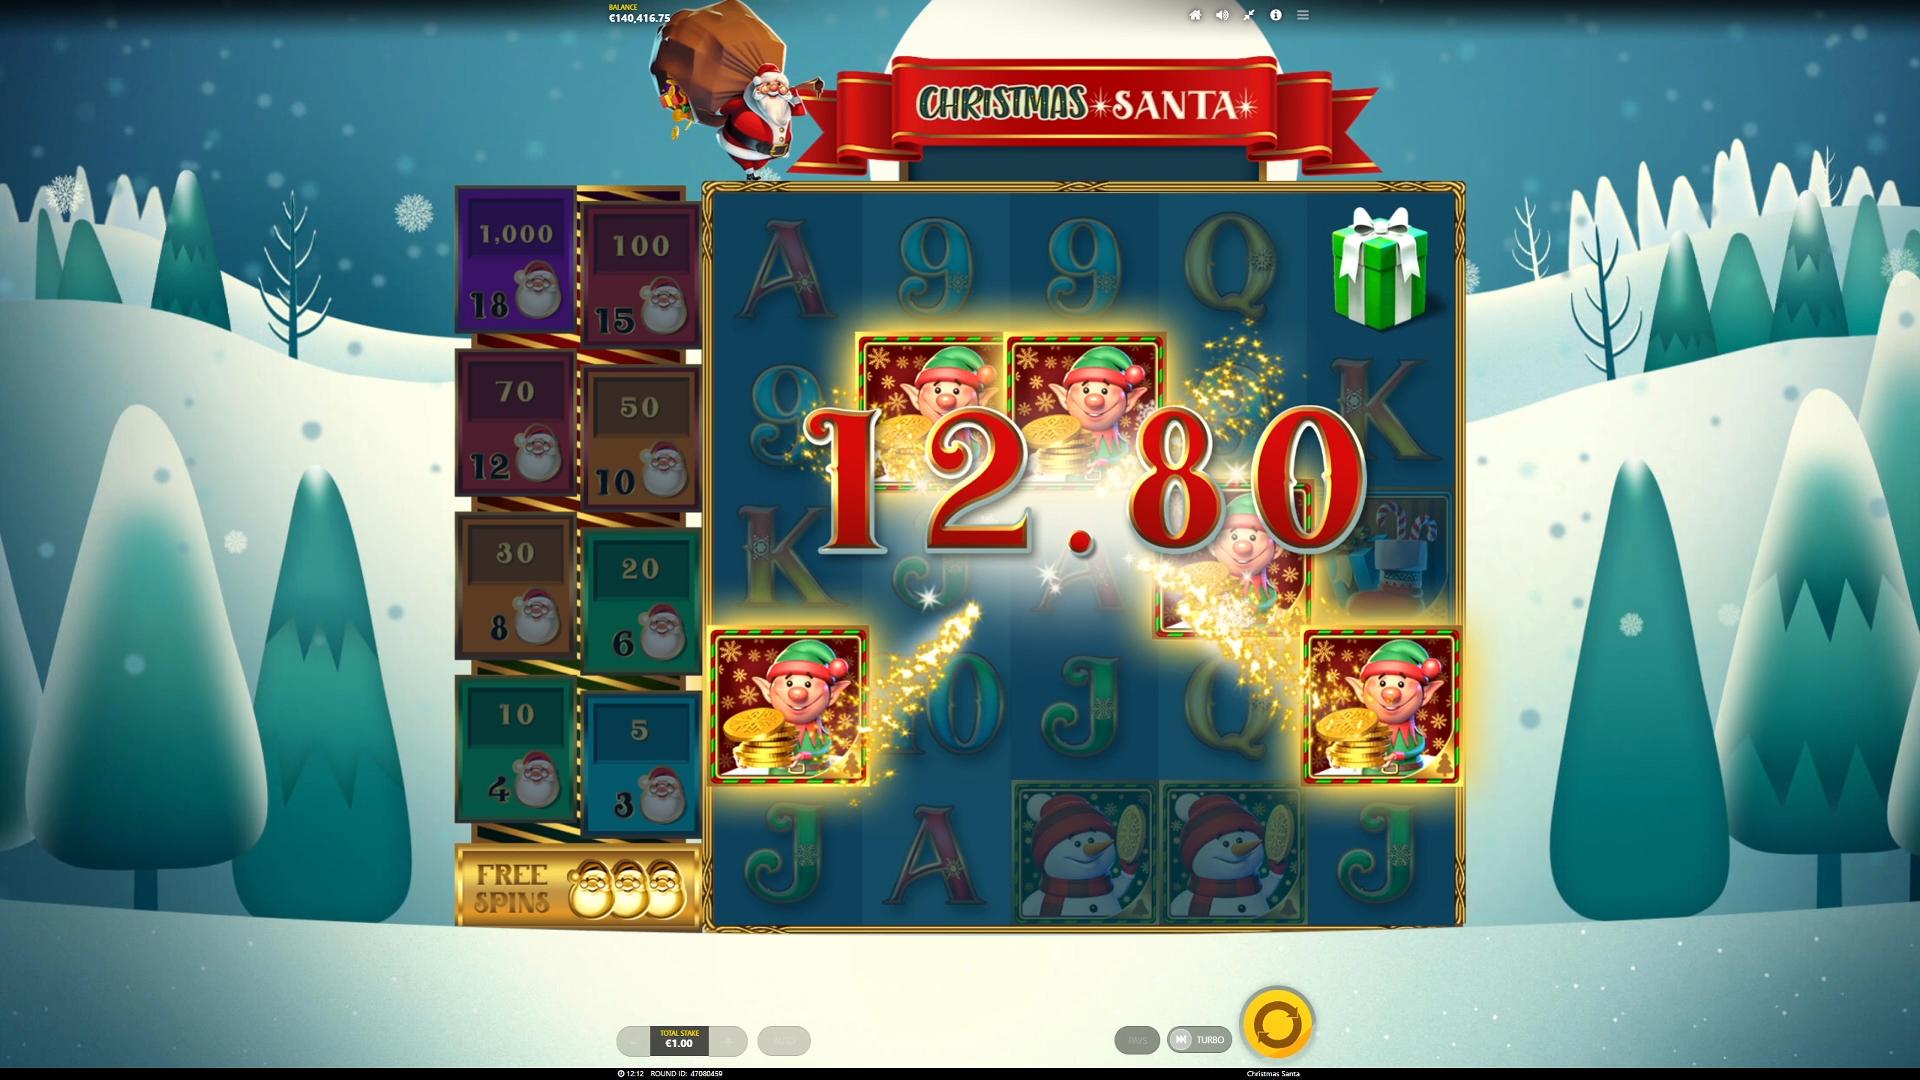 Christmas_Santa_Screenshot_Win_High_Symbol